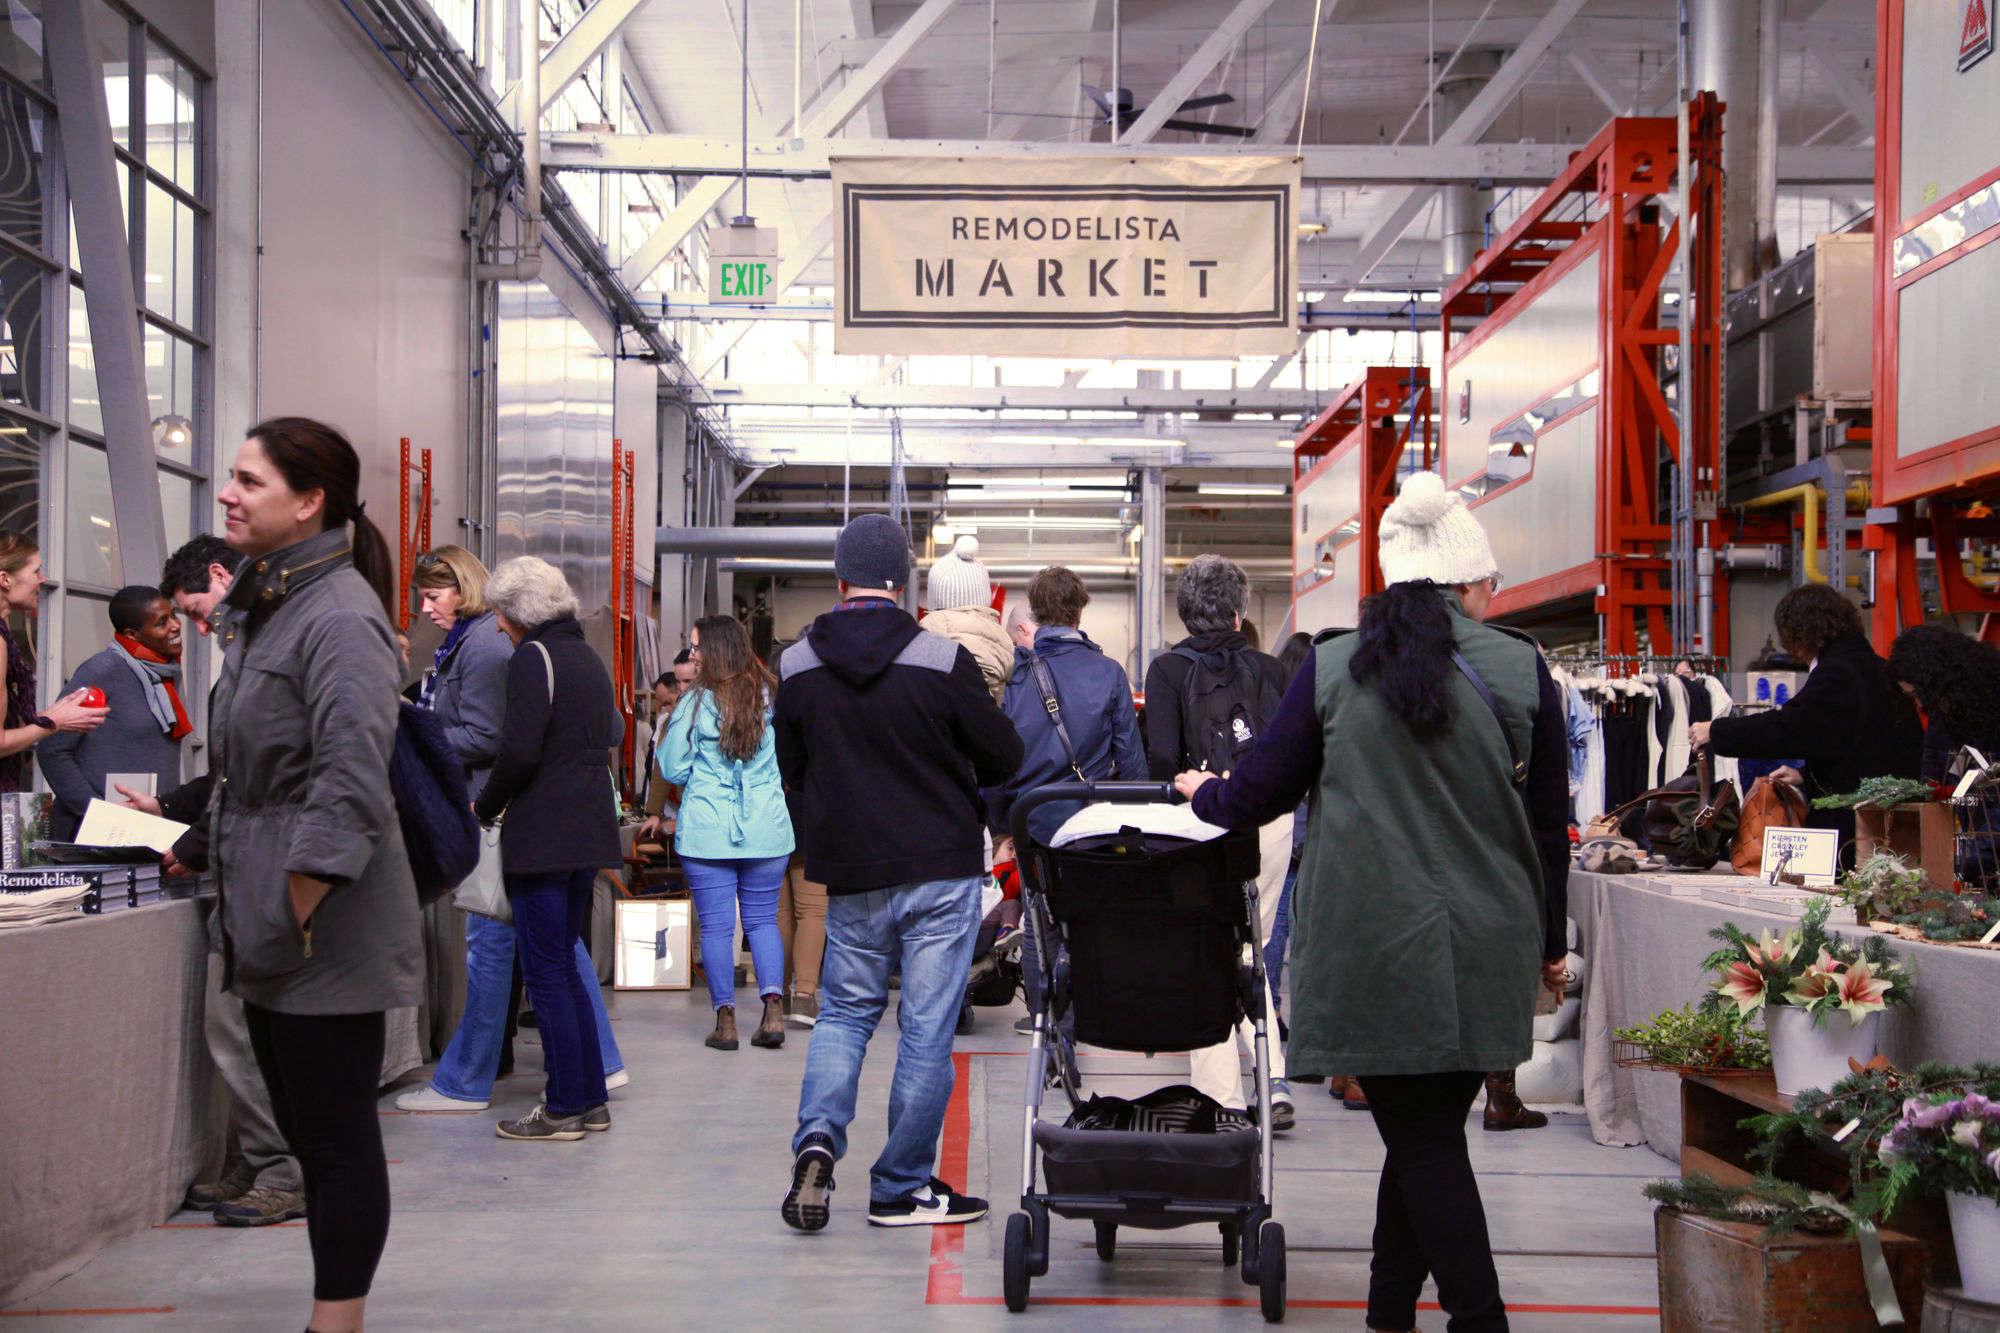 remodelista markets shop our favorite artisans and craftmen